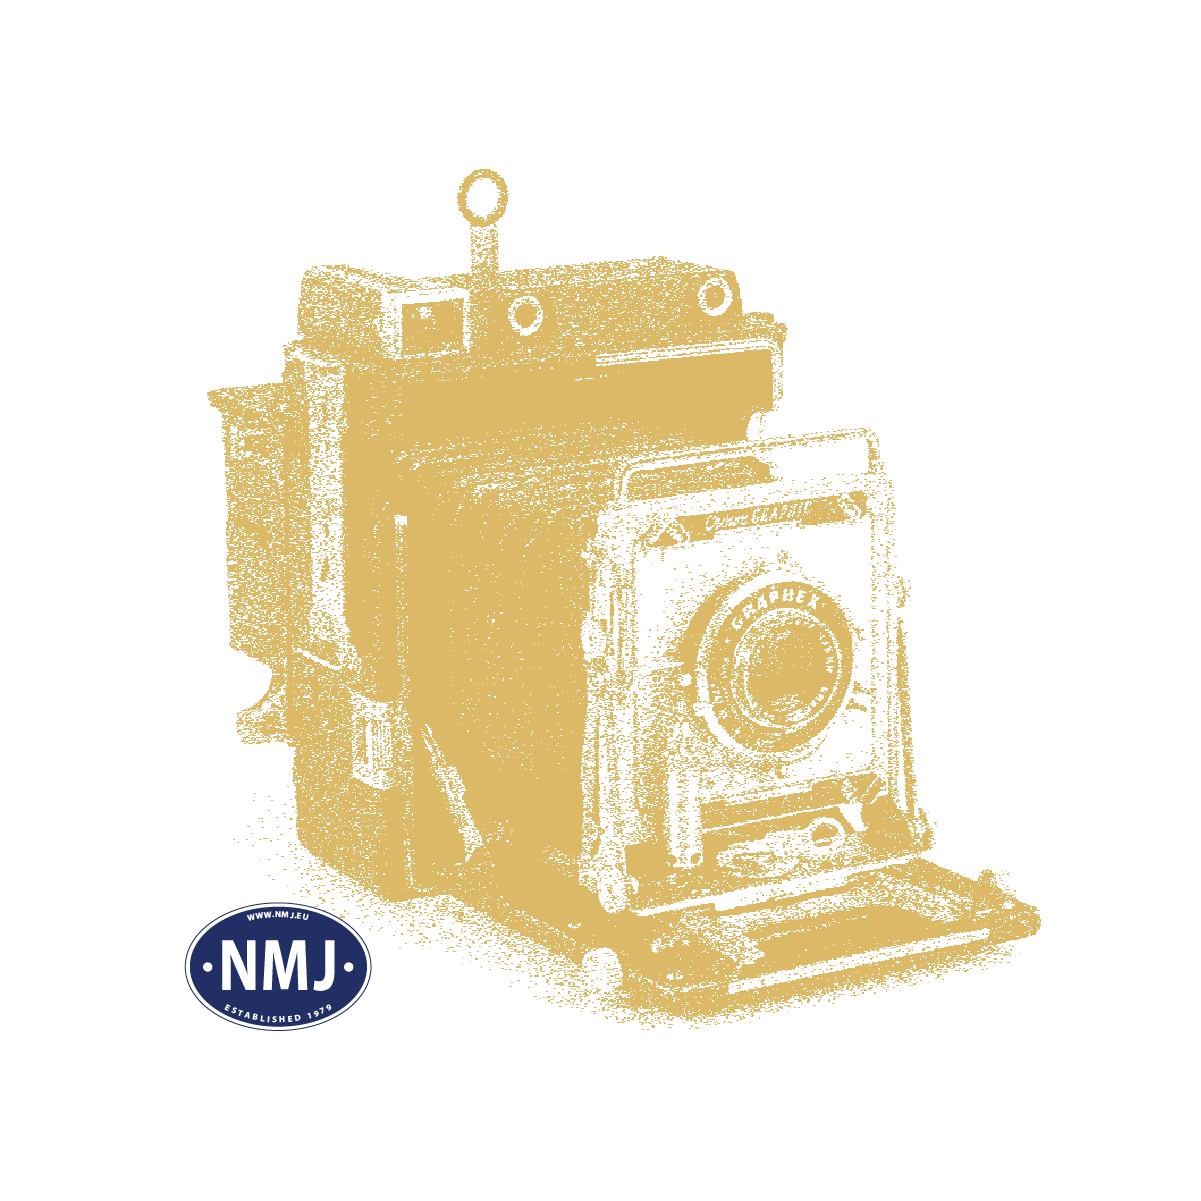 "NMJT132.304 - NMJ Topline NSB CB2 21225 ""Intercity Spesial"", Nydesign"